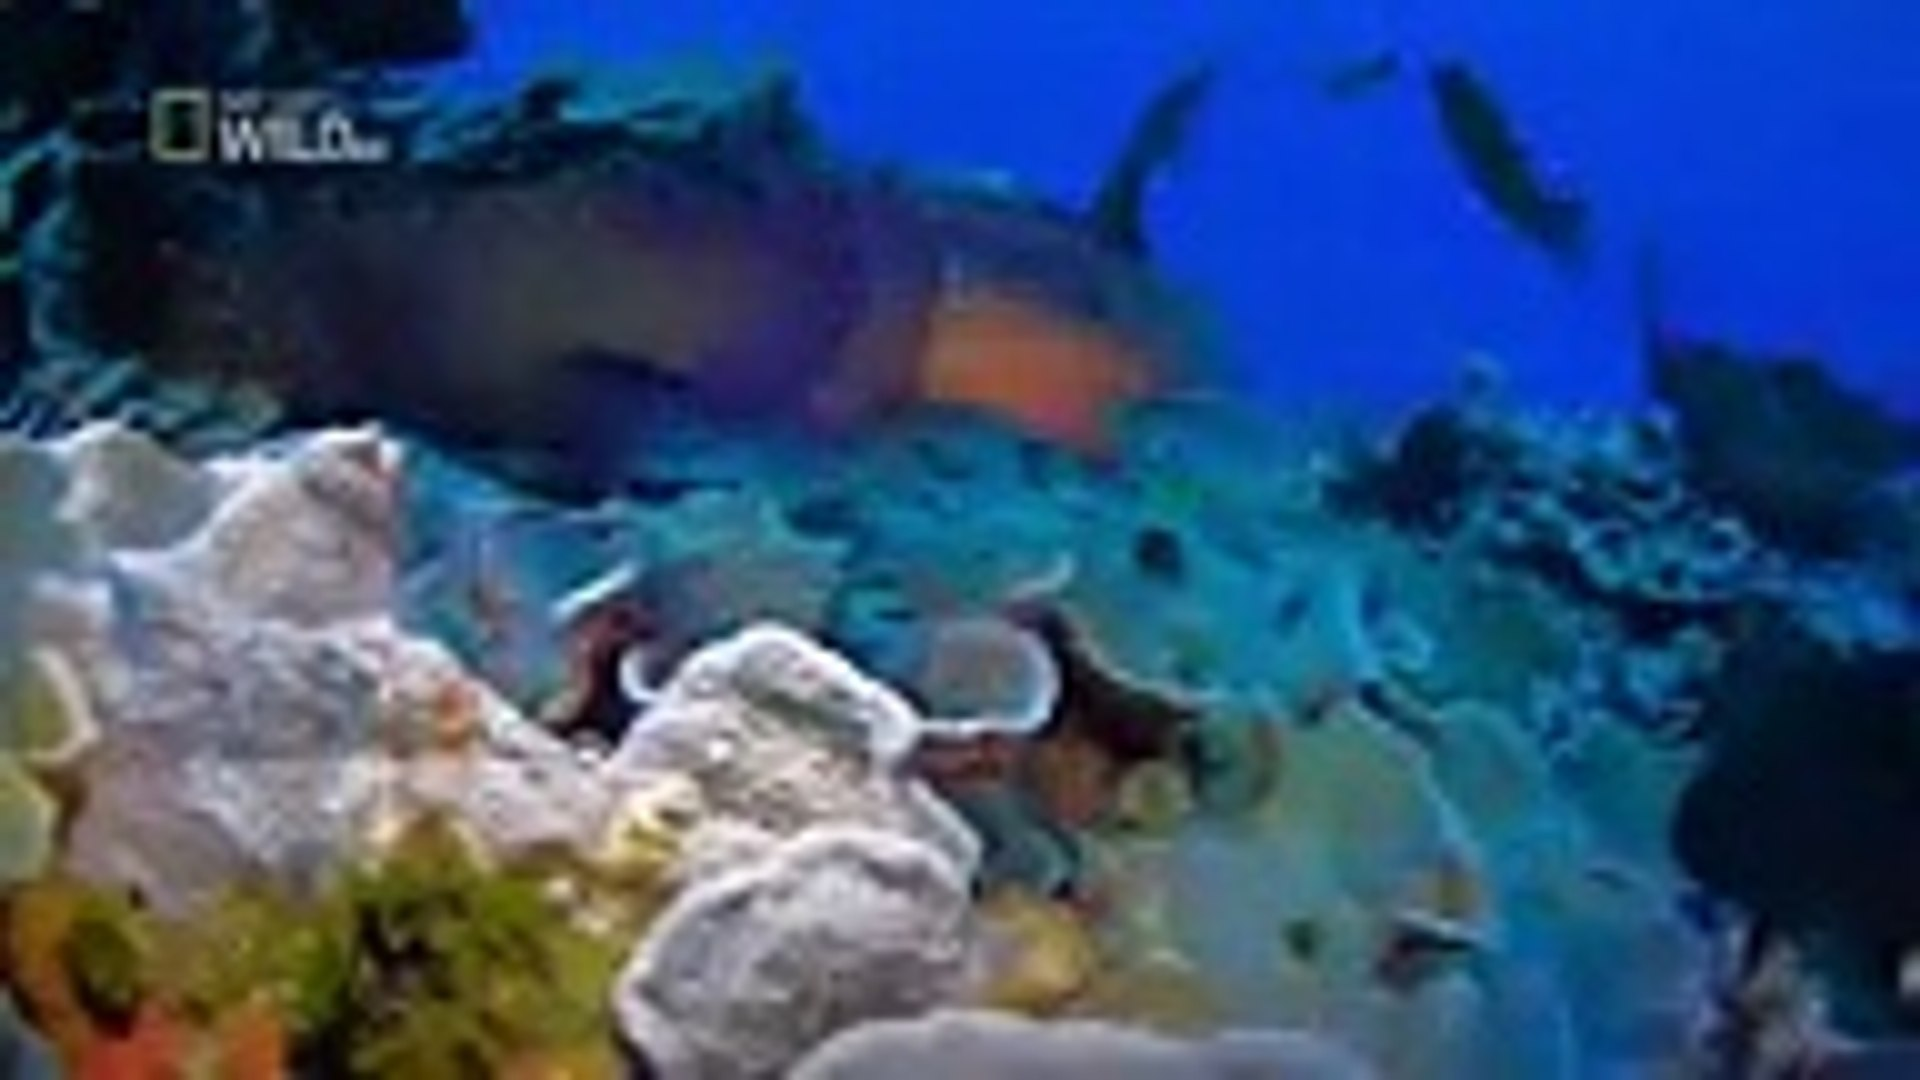 Ocean animals documentaries 2016 - animal planet HD - wild animals ,Tv series 2018 movies action com